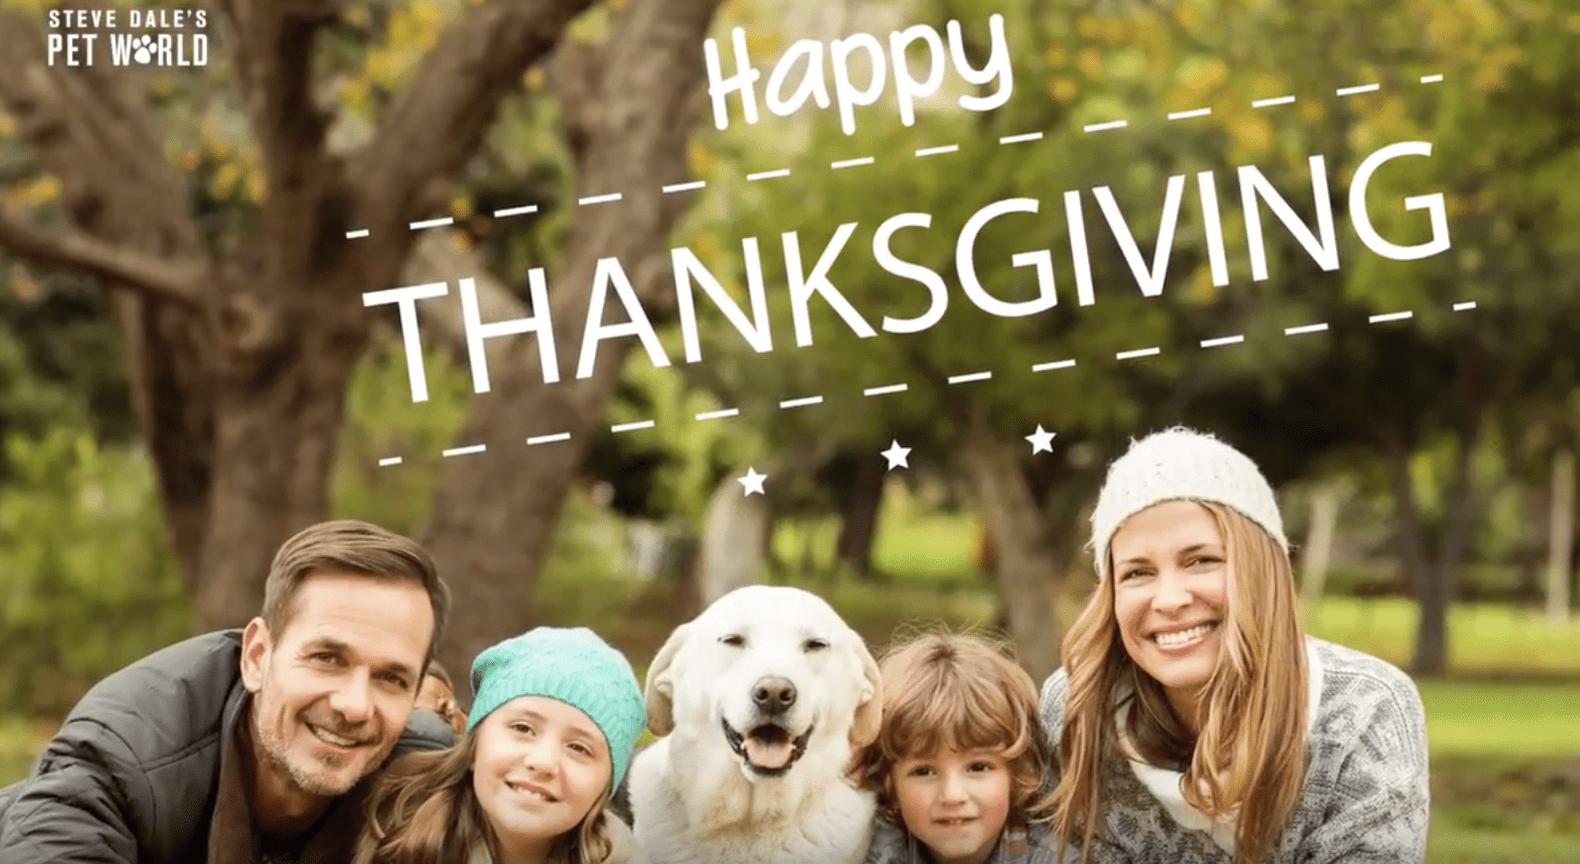 Pet expert Steve Dale Thanksgiving pet safety video